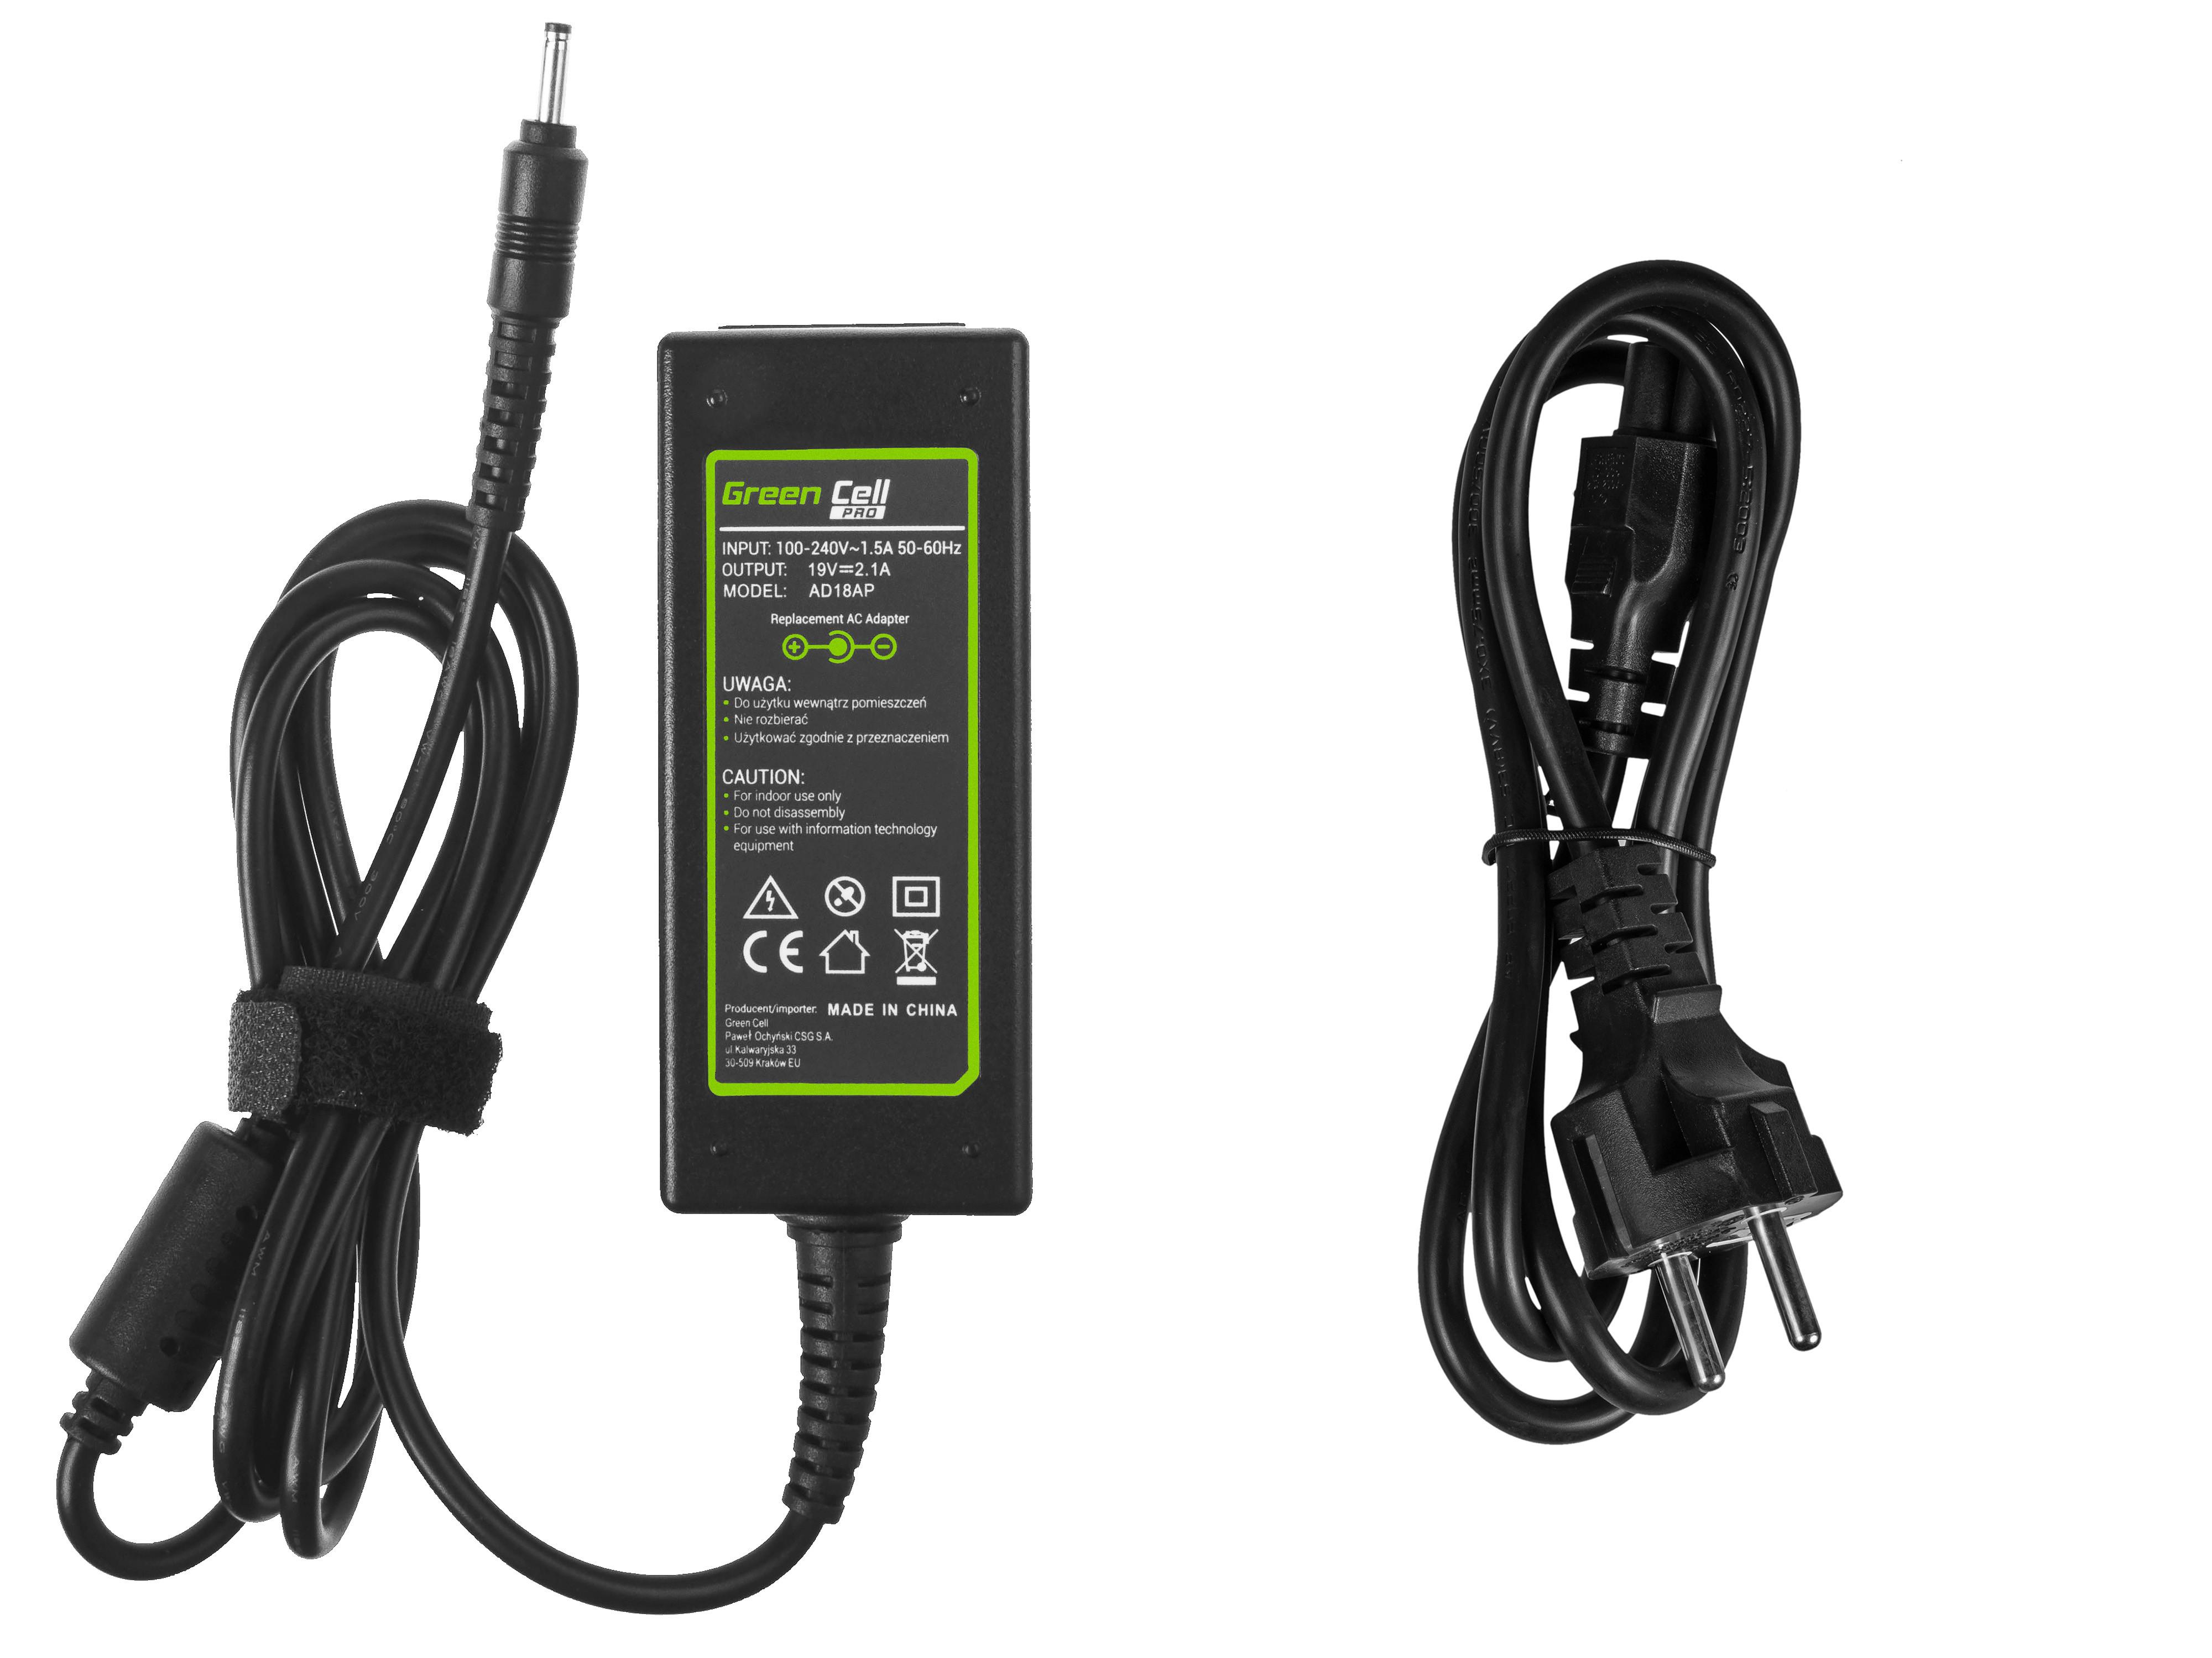 Green Cell AD18AP Nabíječka adaptér pro Samsung 530U NP530U3B NP530U3C 535U NP535U3C NP540U3C NP900X3C NP905S3G 19V 40W